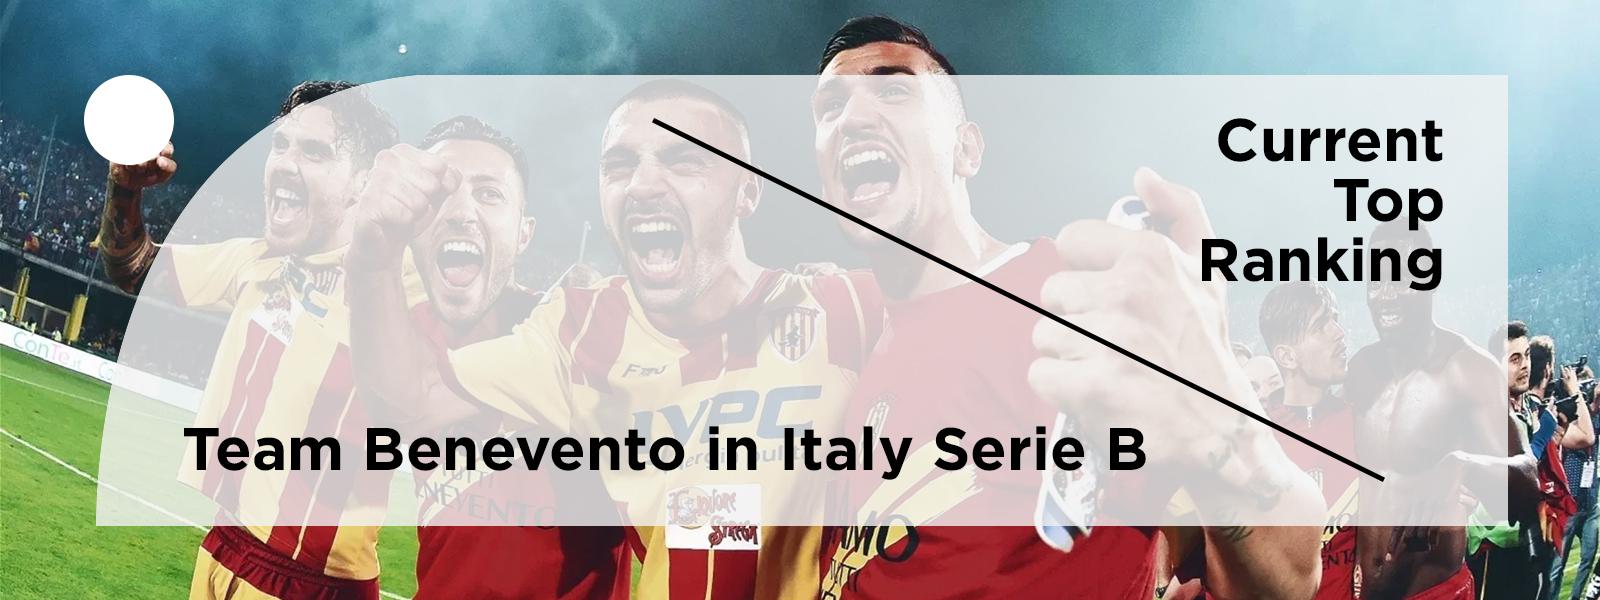 Top Ranking Team - Benevento Calcio In Italy Serie B 2020